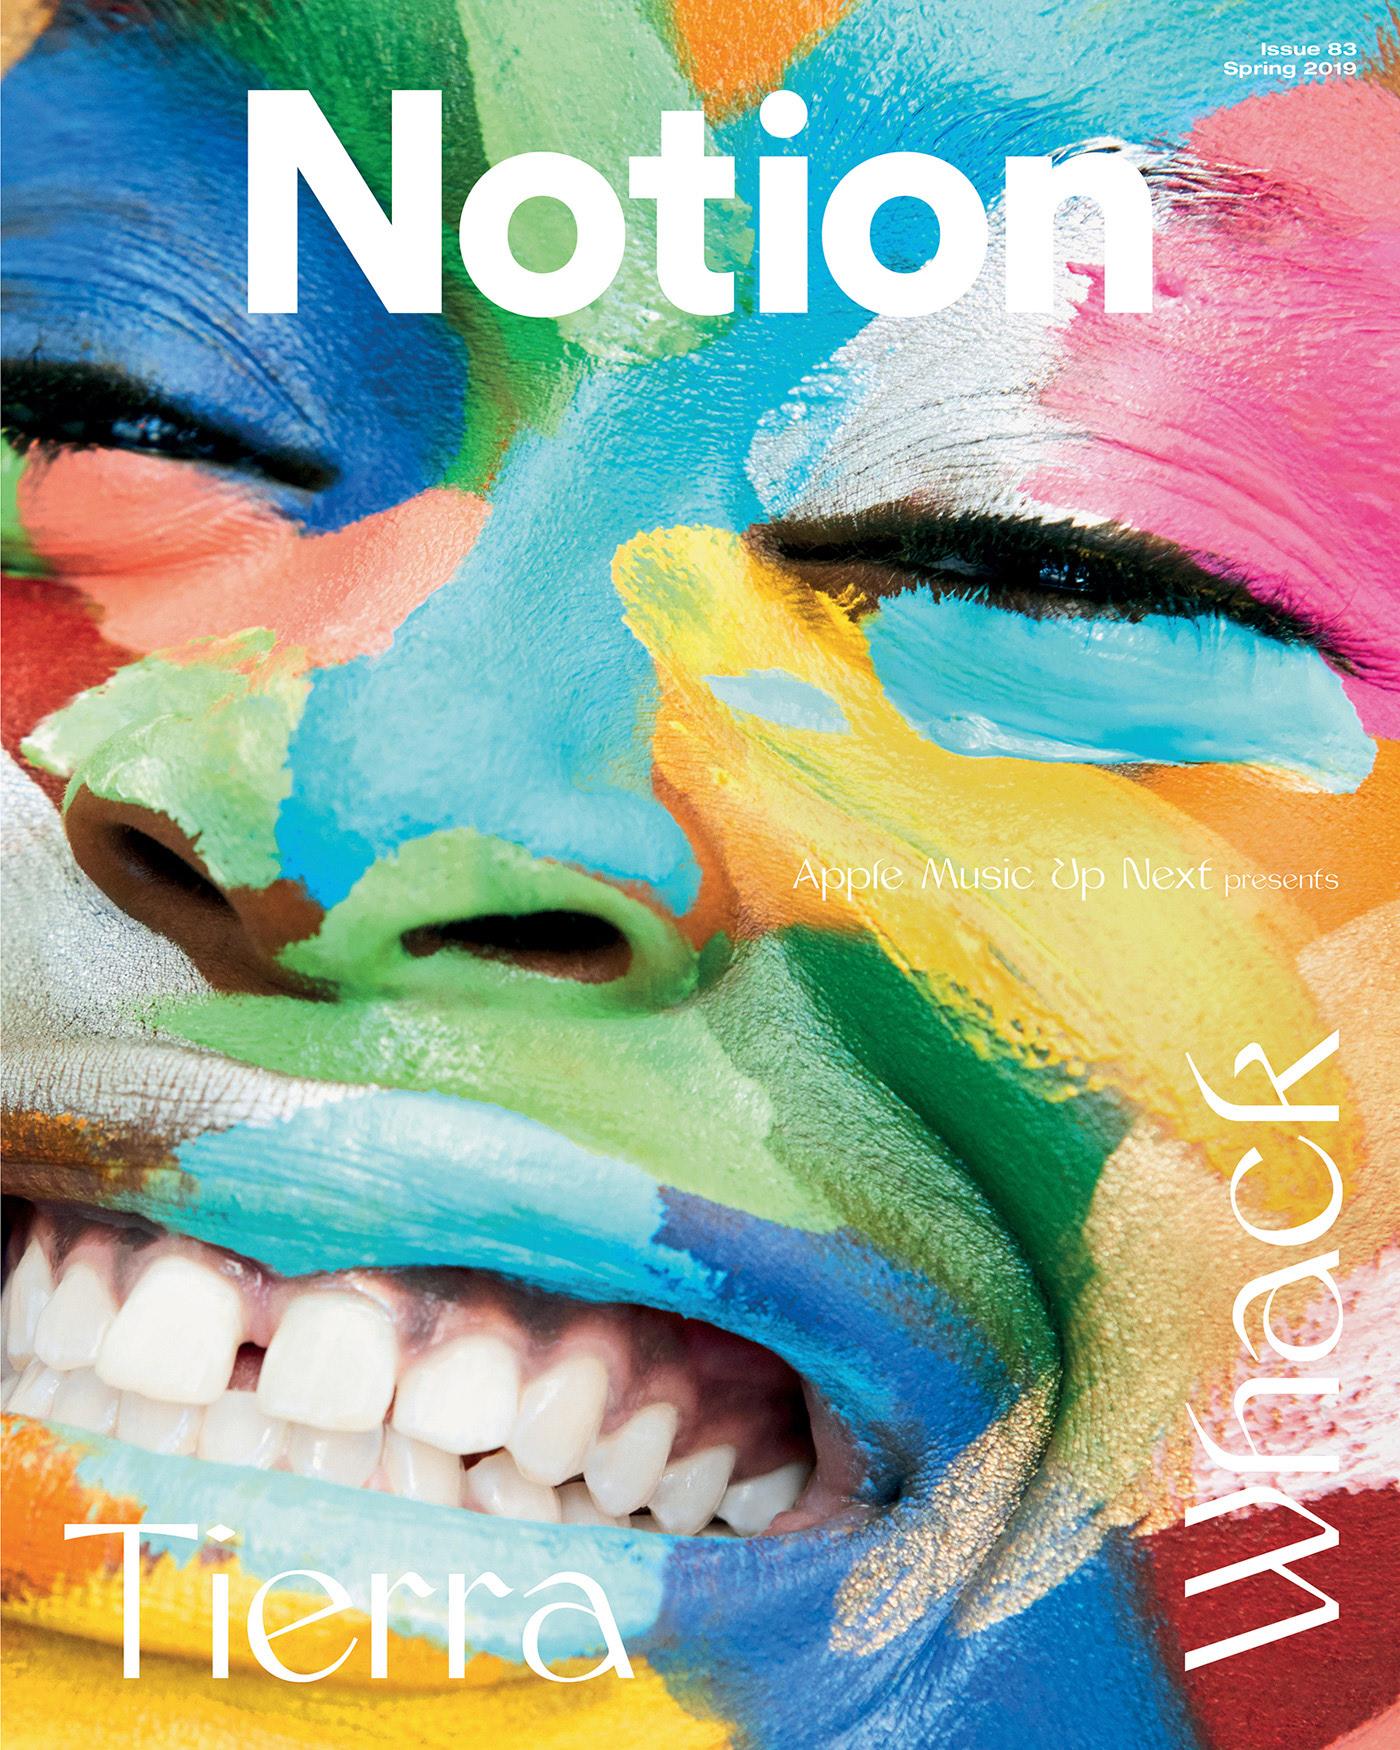 Tierra Whack shot for NOTION Magazine